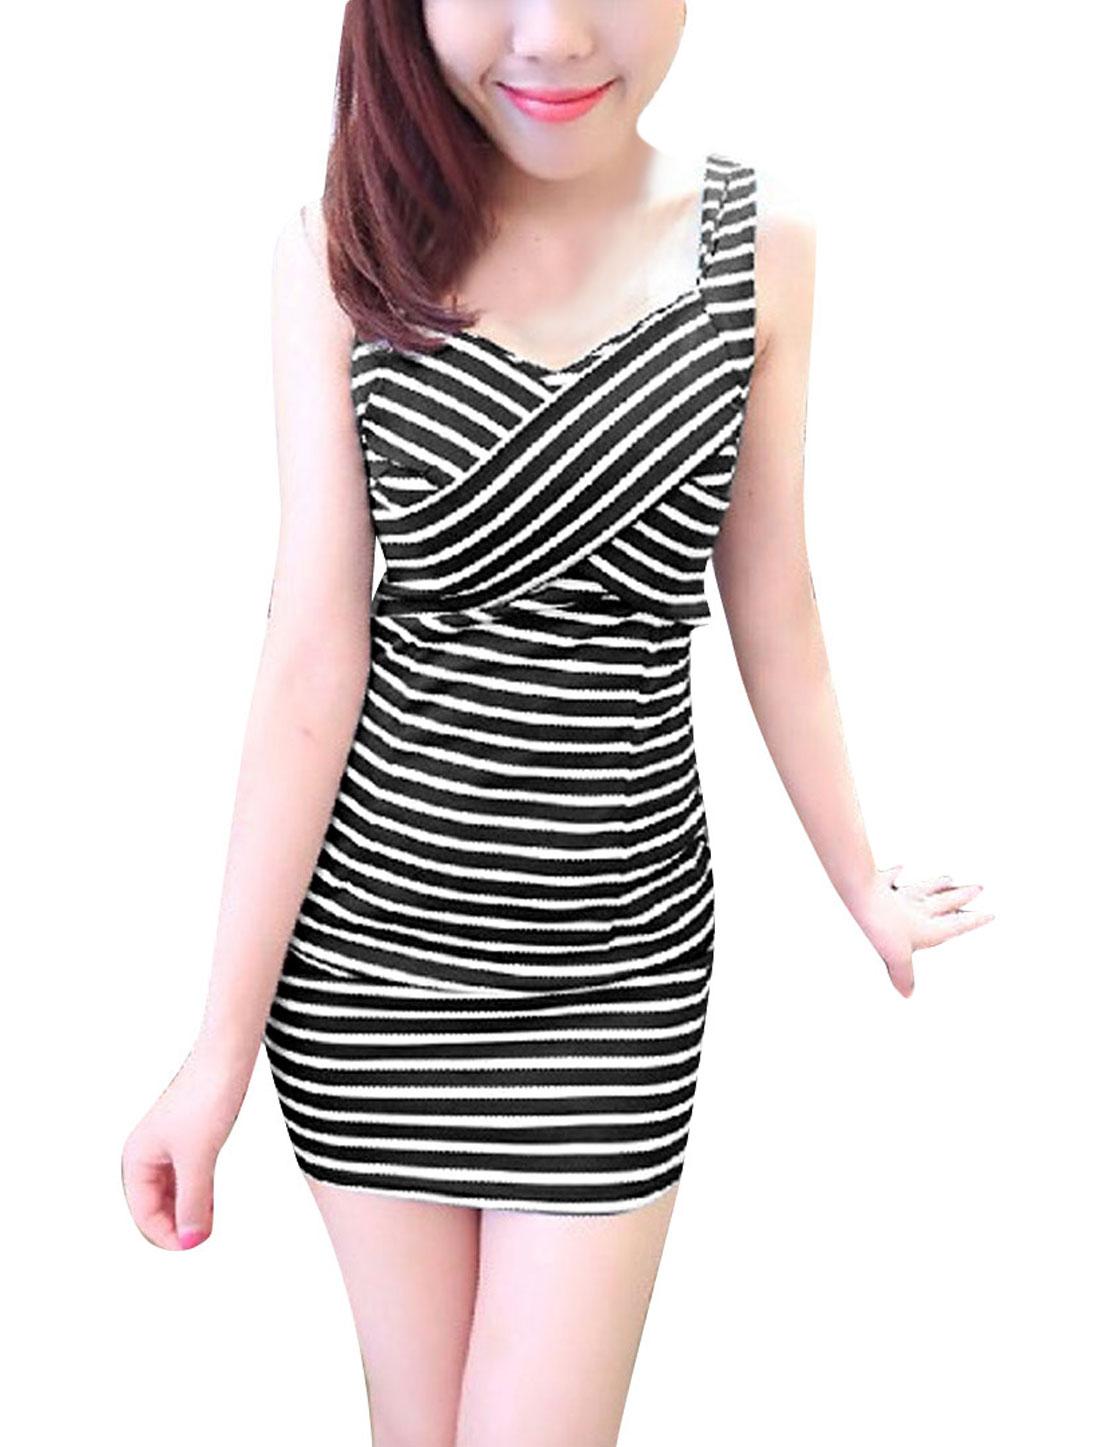 Woman Shoulder Straps Design Concealed Zipper Back Black Striped Mini Dress XS